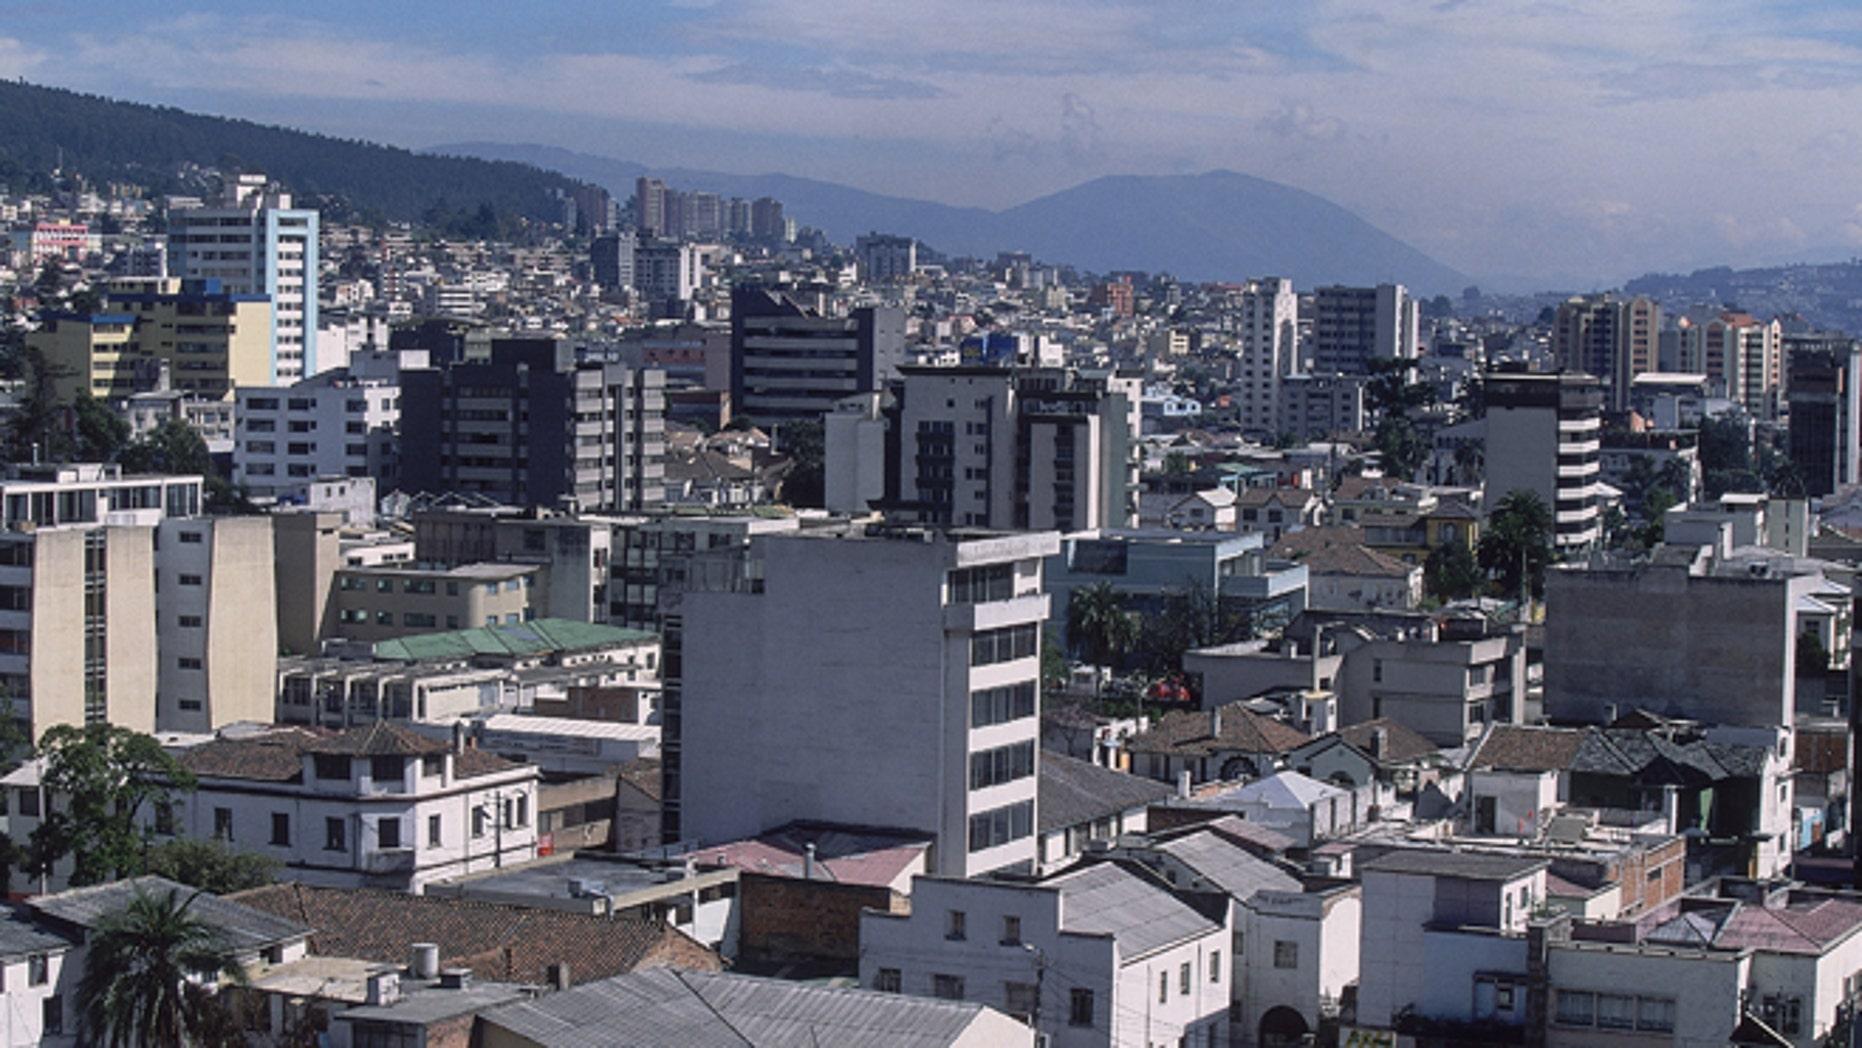 General view of the Ecuadorian city of Quito.